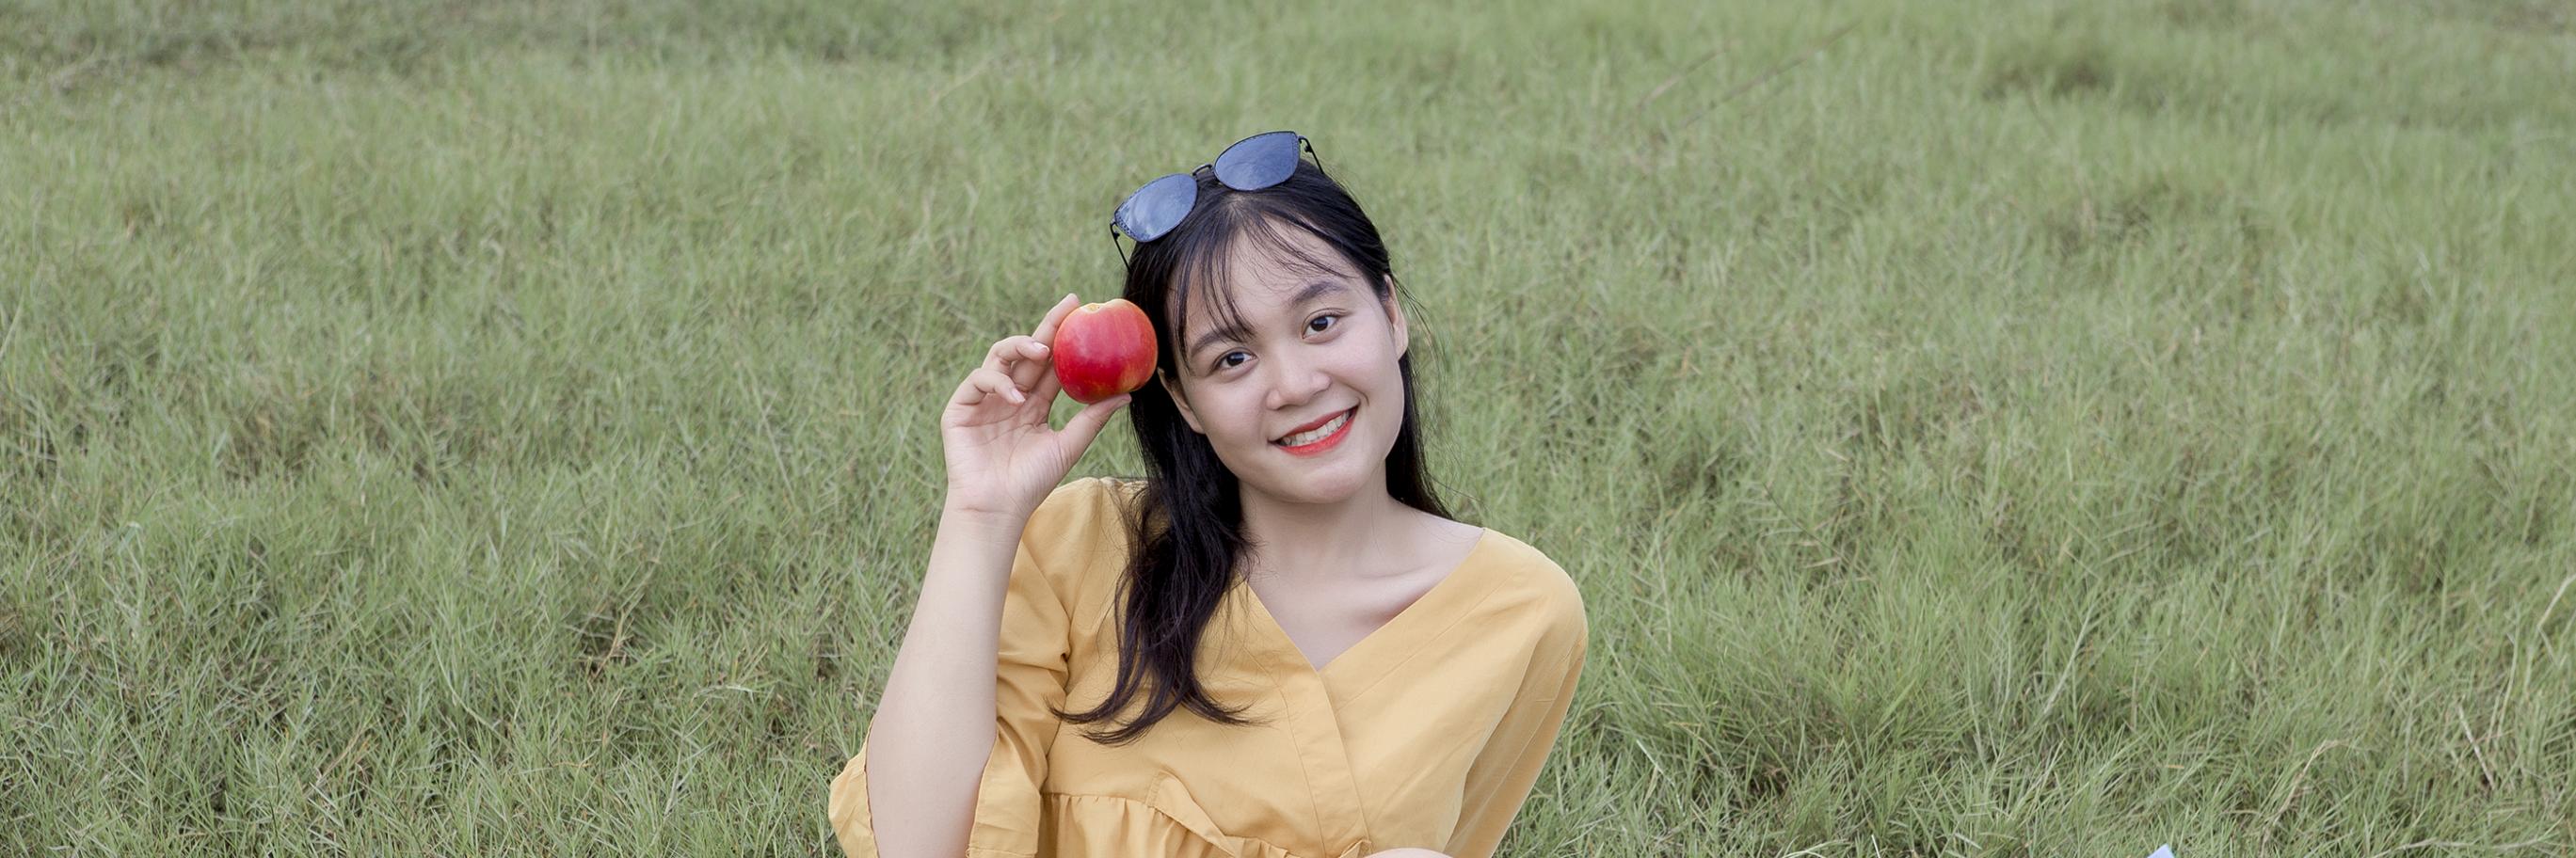 https://gody.vn/blog/lequangbaochung994907/post/cung-den-hue-checkin-ho-son-tho-thao-nguyen-xanh-giua-long-thanh-pho-7334